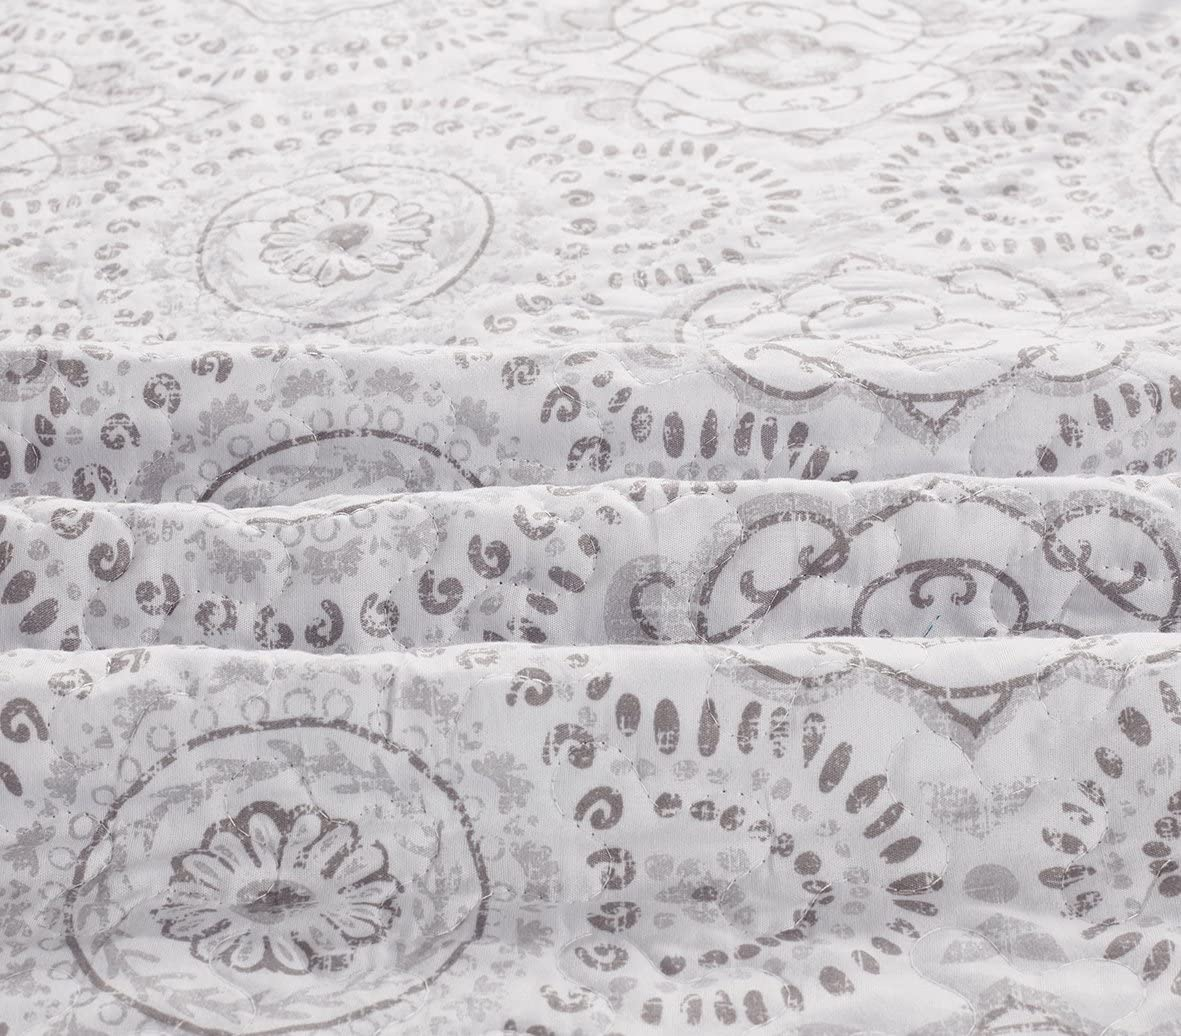 Modern Lightweight Quilted Bedspread SLPR Sense of Calm 2-Piece Bedding Quilt Set Twin with 1 Sham